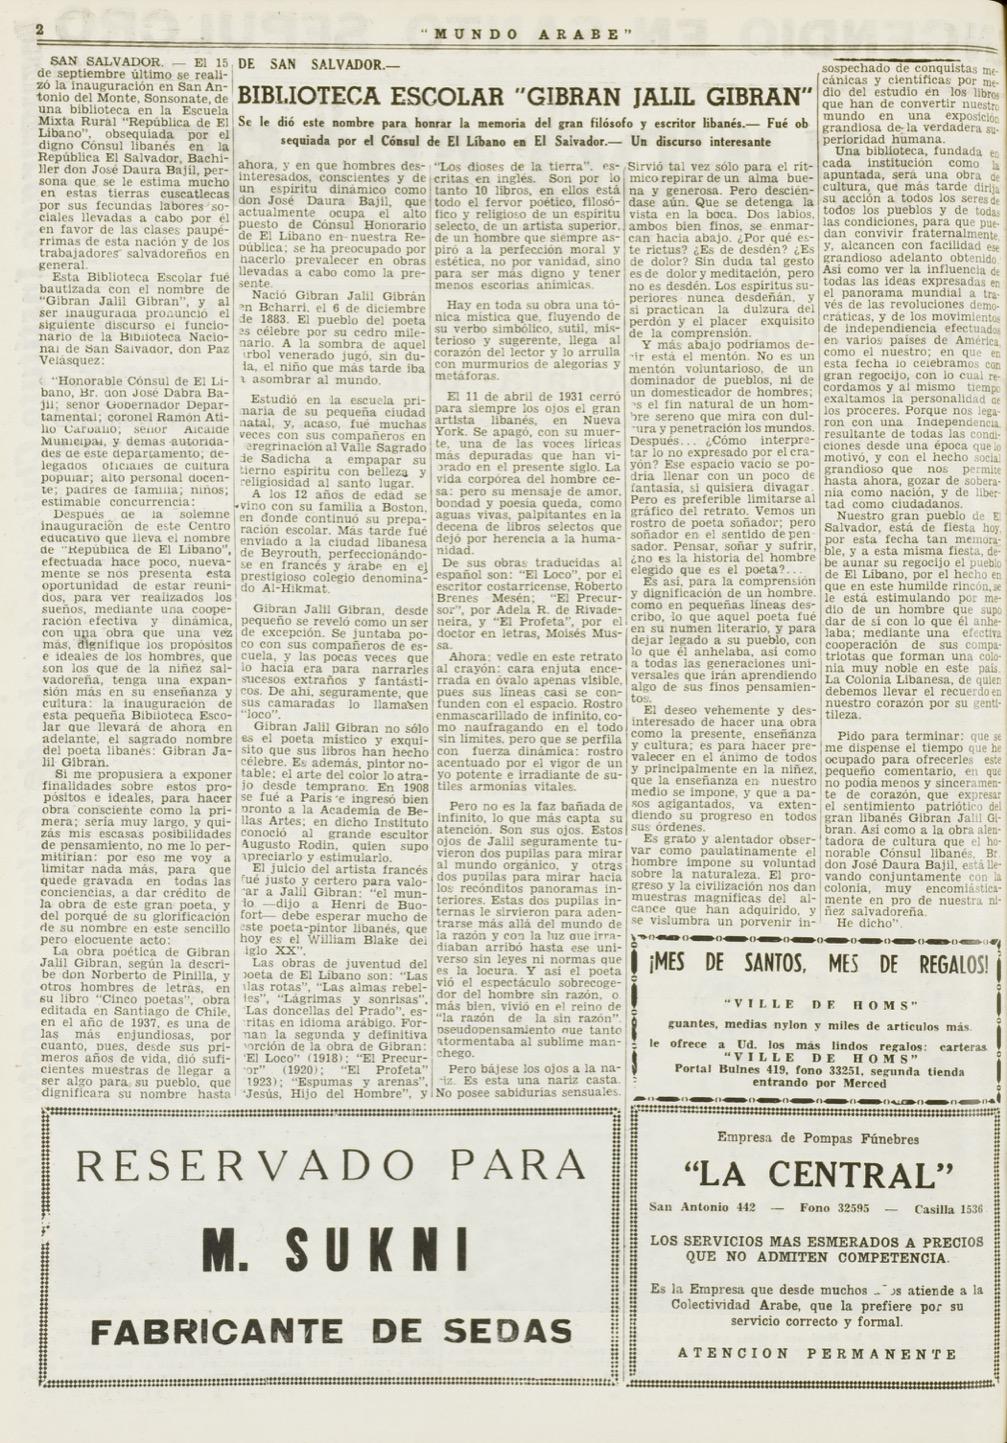 "Biblioteca Escolar ""Gibrán Jalil Gibrán"", Mundo Árabe, Dec 2, 1949, p. 2."